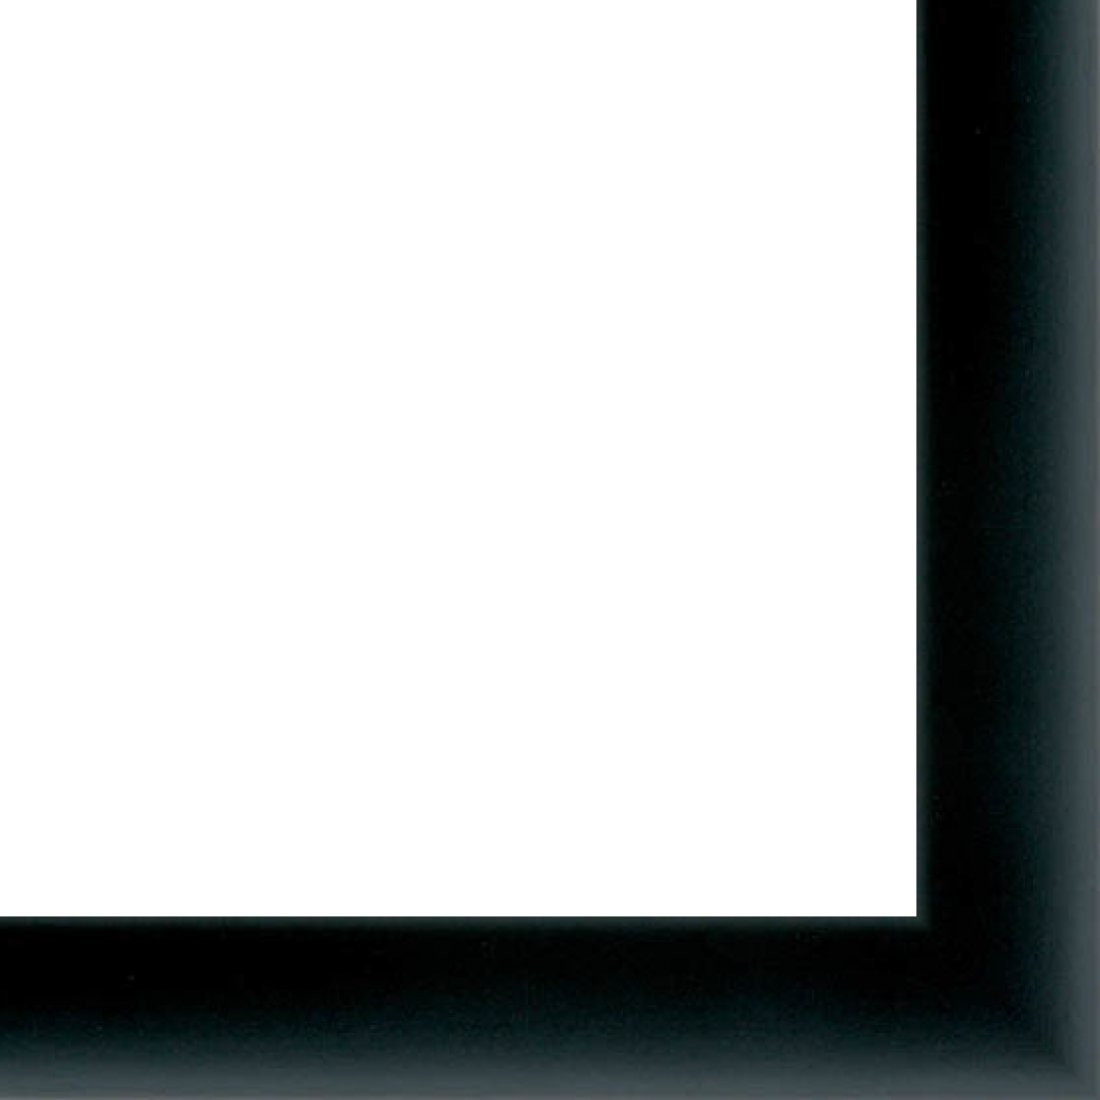 Picture Frame Moulding (Wood) 18ft bundle - Contemporary Black Finish - 0.75'' width - 3/8'' rabbet depth